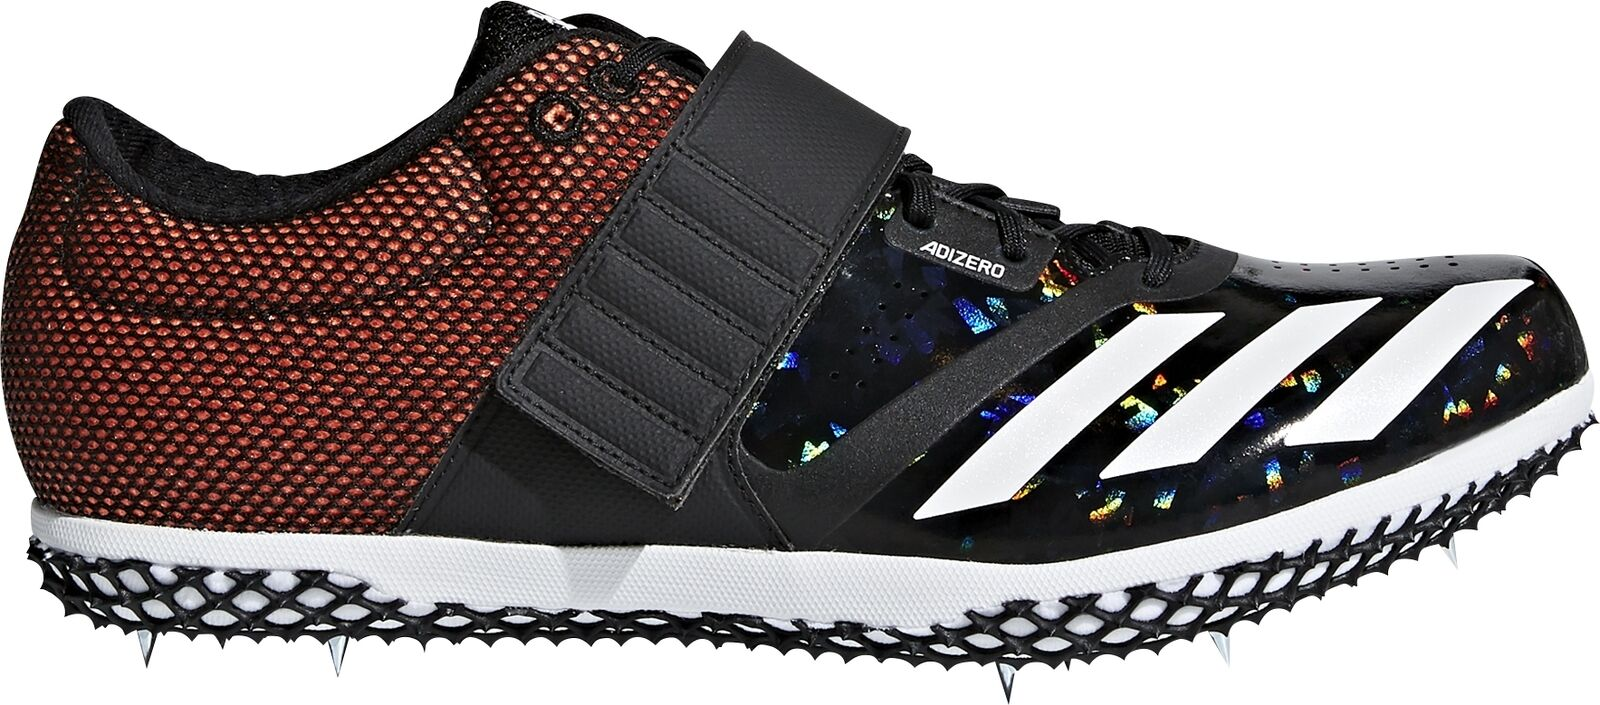 Adidas Adizero High Jump Field Event Spikes - negro